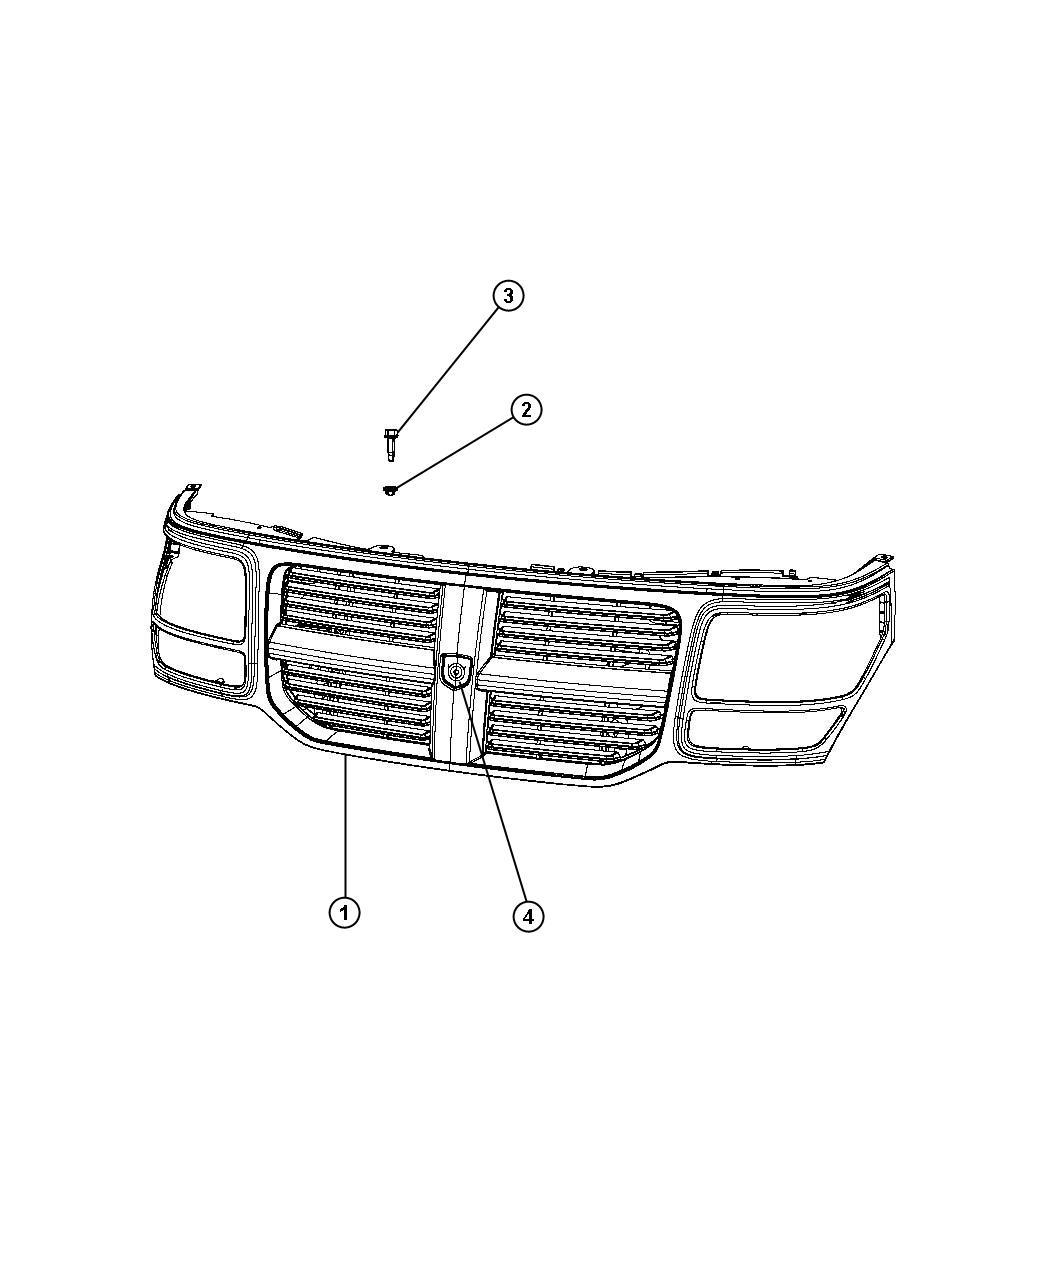 Dodge Nitro Grille Radiator W1 With Sales Code